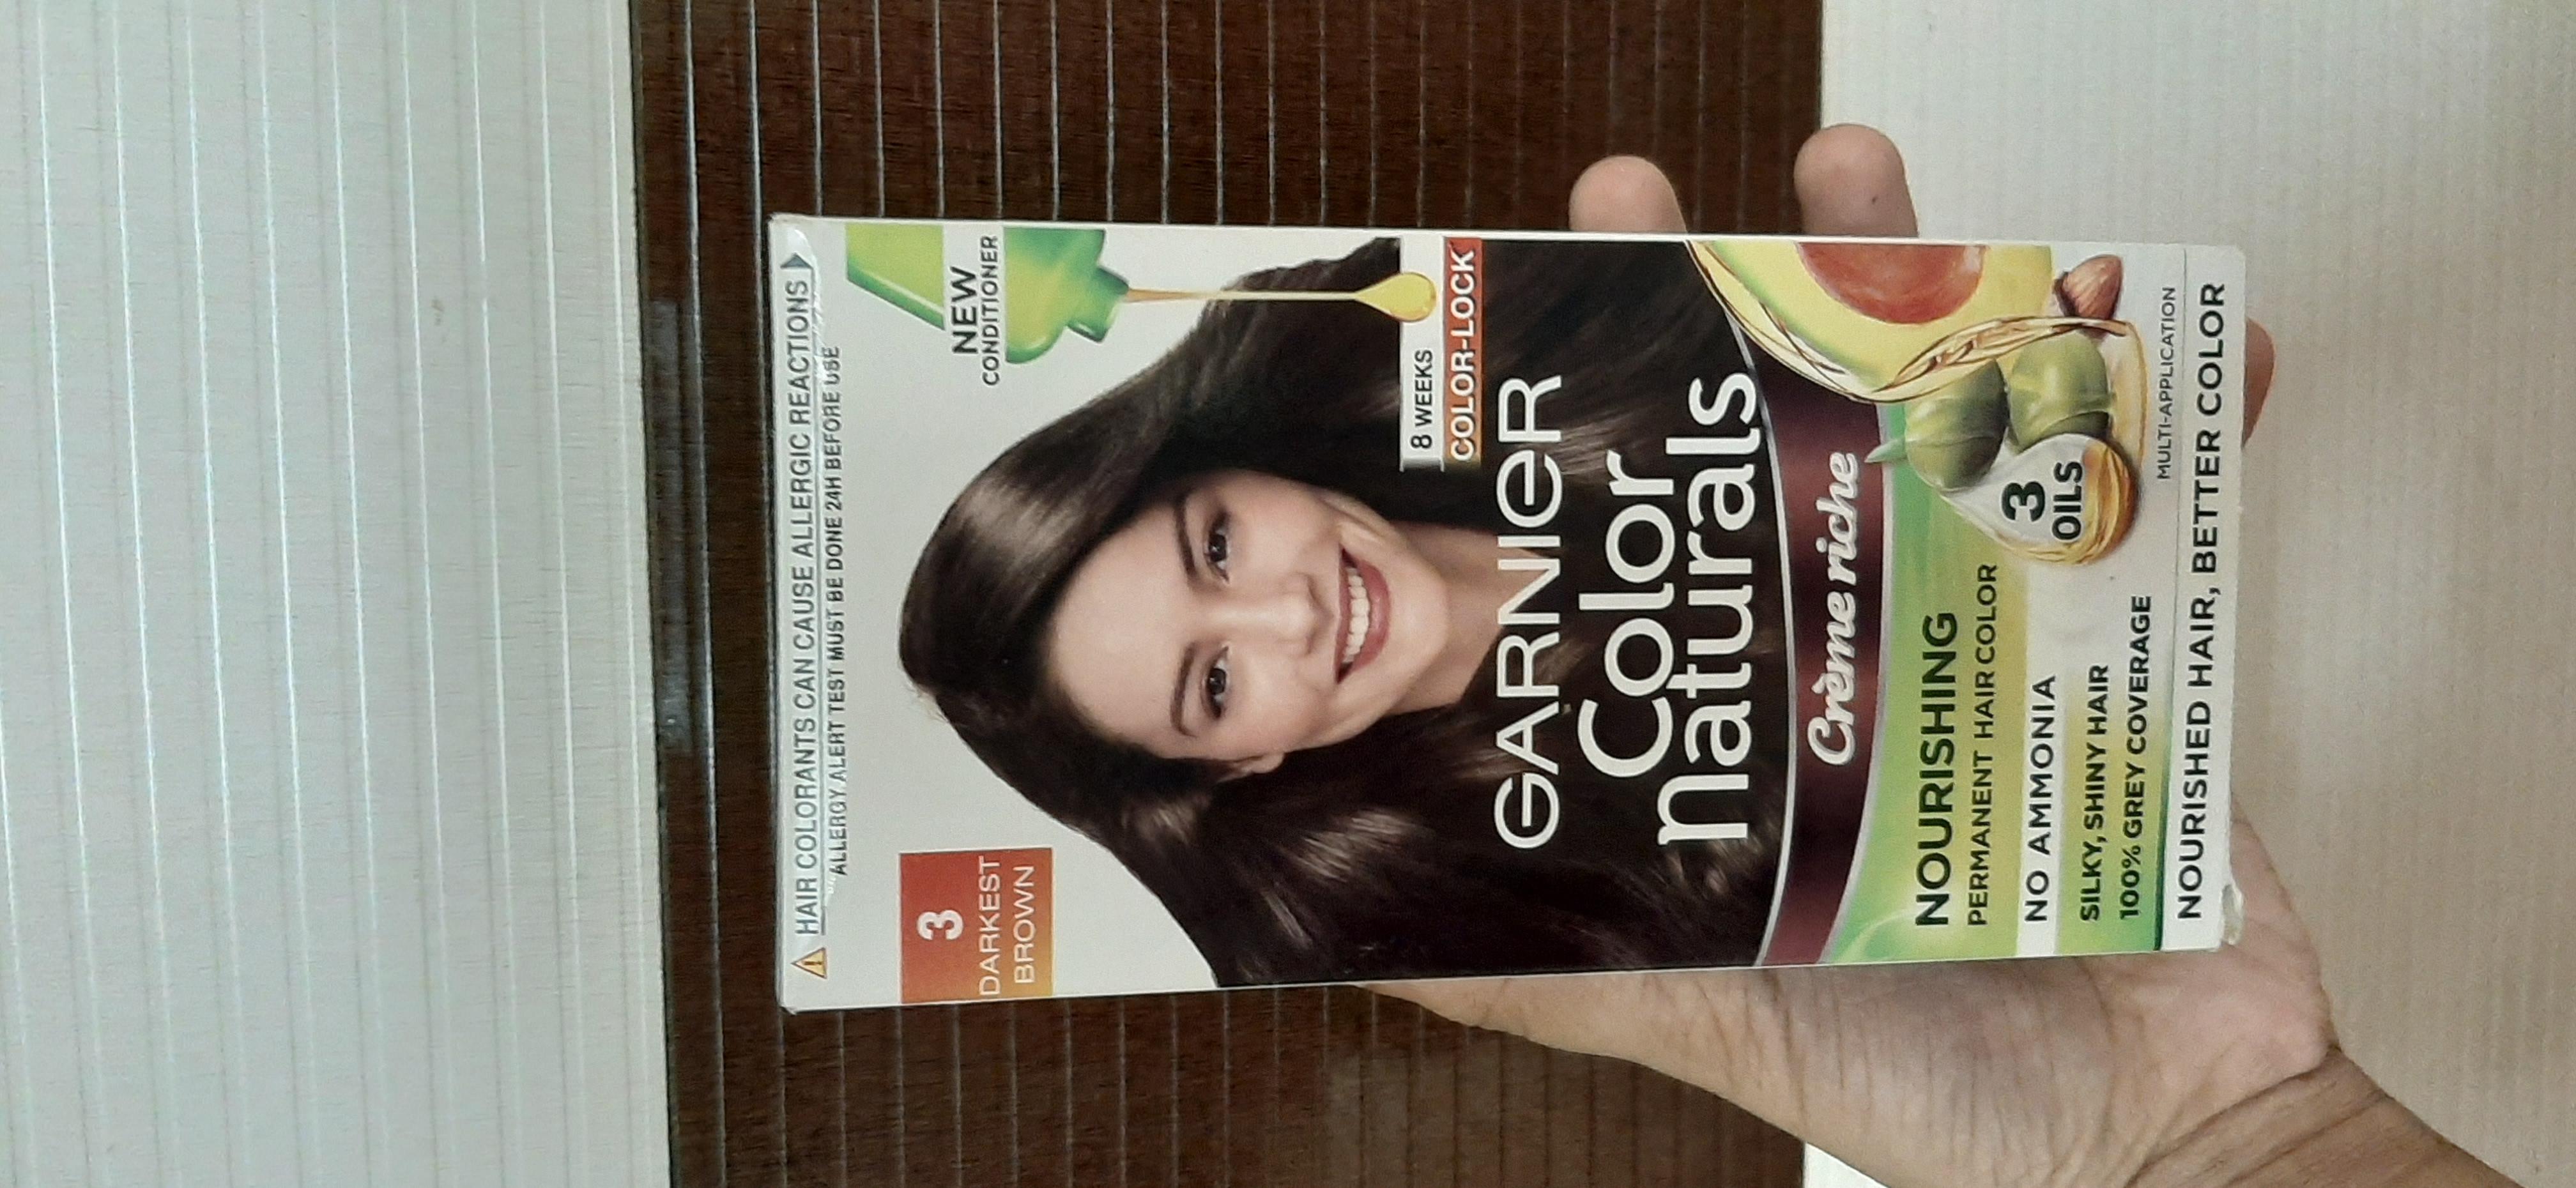 Garnier Color Naturals Creme Hair Color-Good product-By samira_haider-6